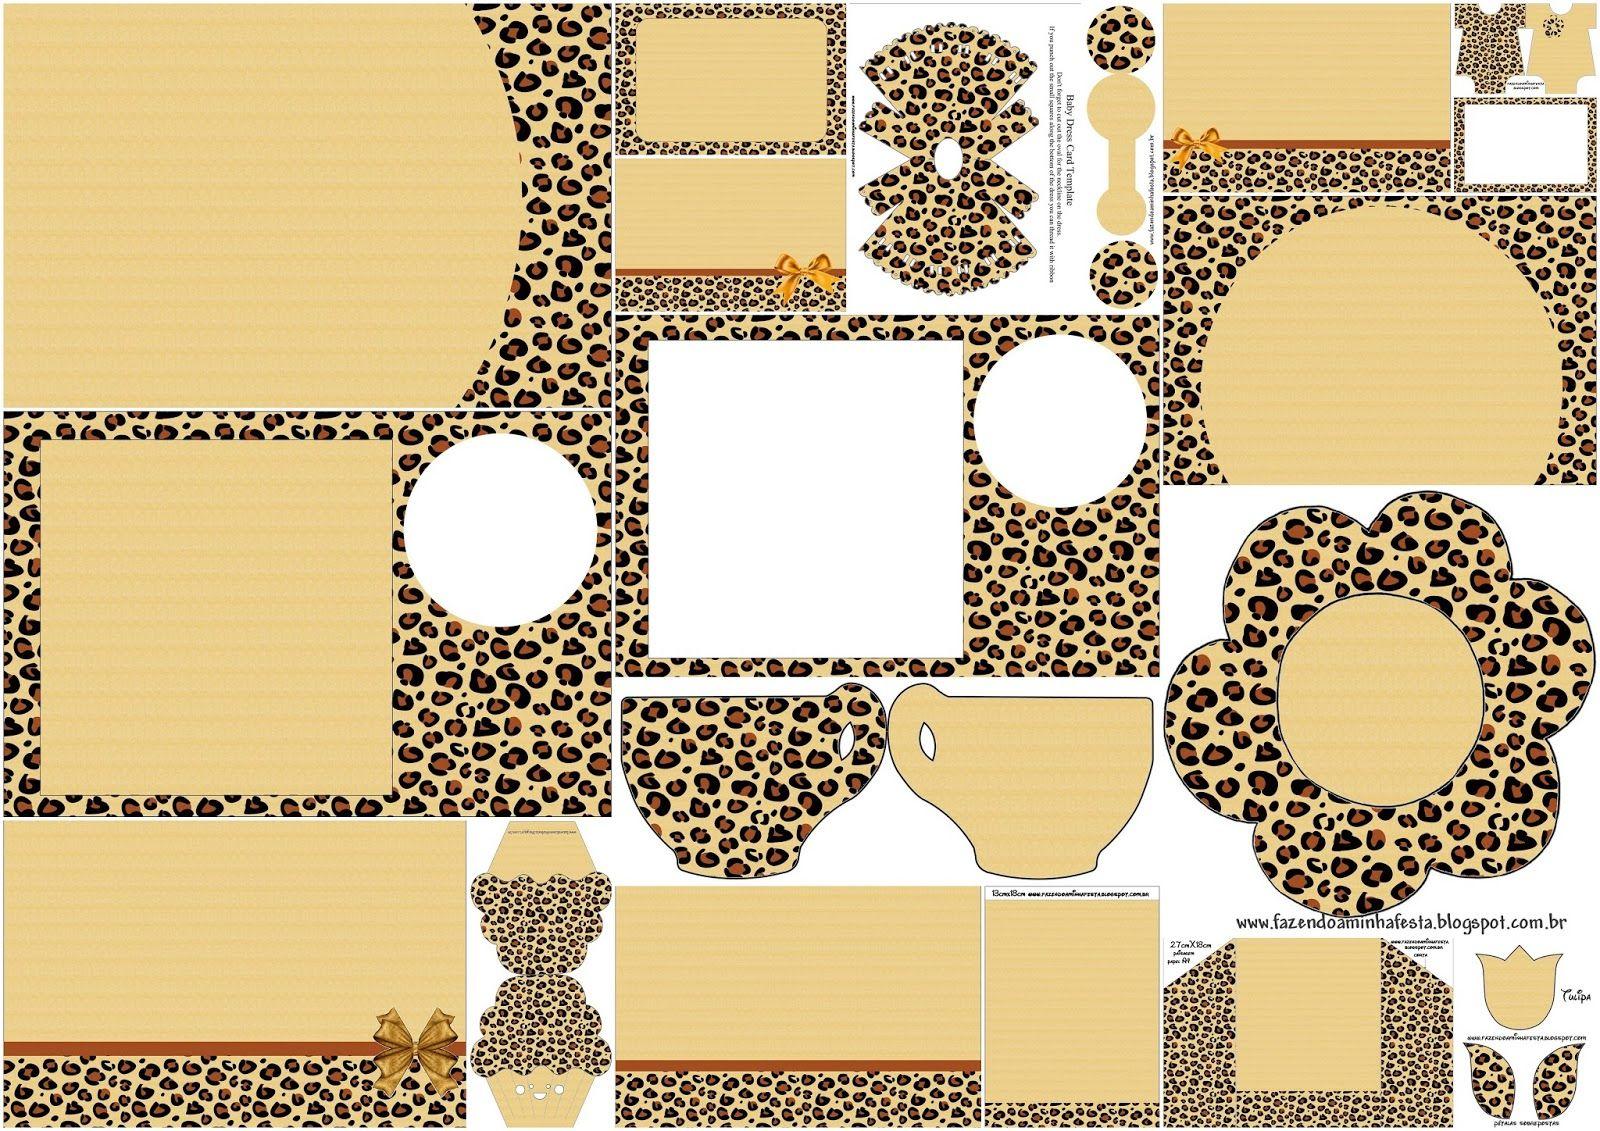 Leopard Prints: Free Printable Invitation.   Party   Pinterest - Free Printable Cheetah Birthday Invitations